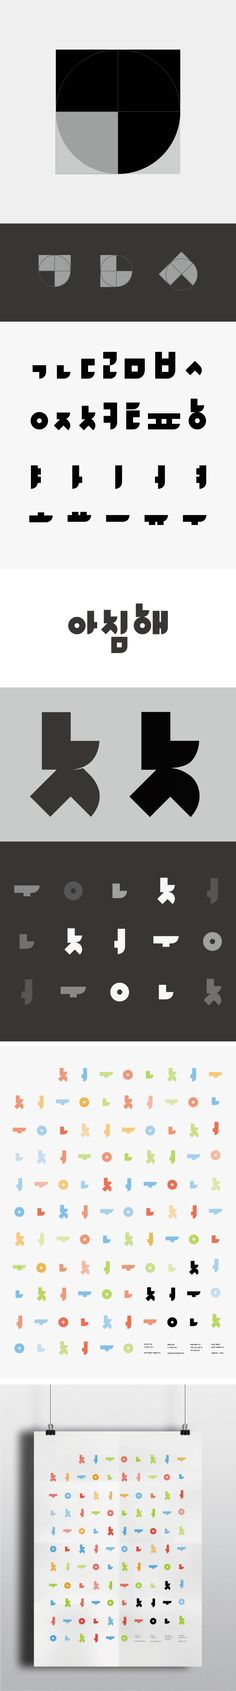 2014 Typography 2 한글 탈네모꼴 개발 / 포스터 (A1) #청춘 타이포그래피 #hangeul designed by #suhyeonkim Typo Design, Word Design, Typographic Design, Graphic Design Posters, Graphic Design Typography, Graphic Design Inspiration, Branding Design, Cute Typography, Typography Letters